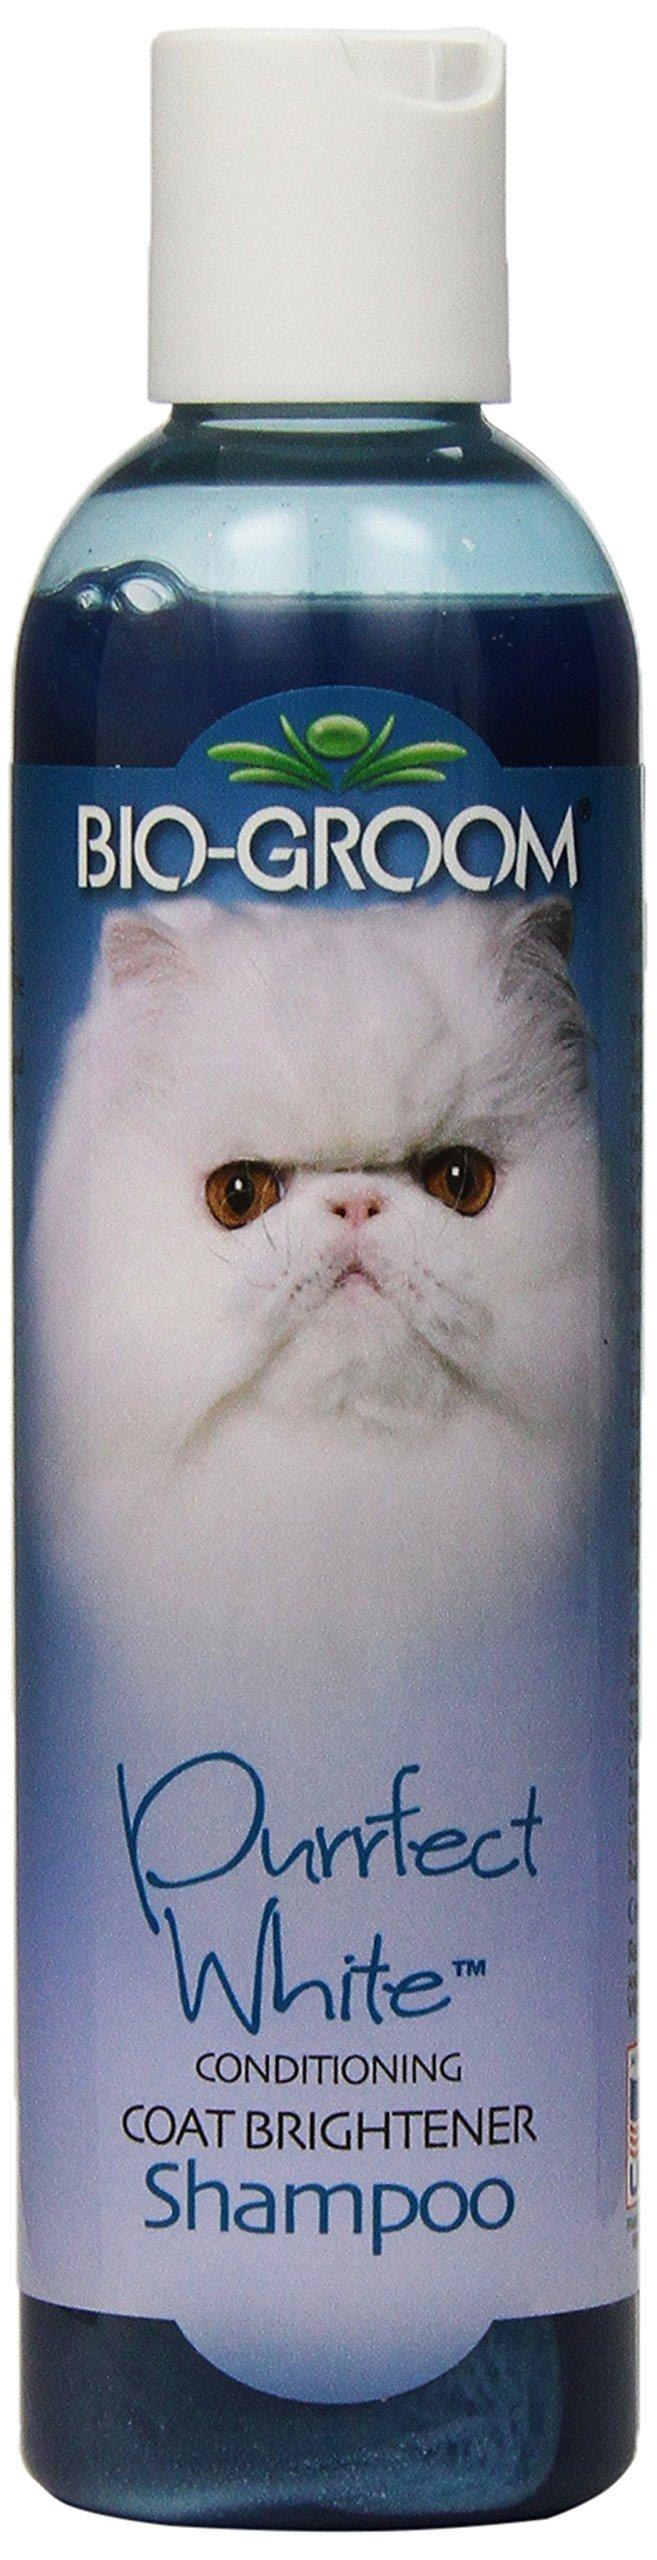 Bio-groom Purrfect White Cat Shampoo, 8-Ounce